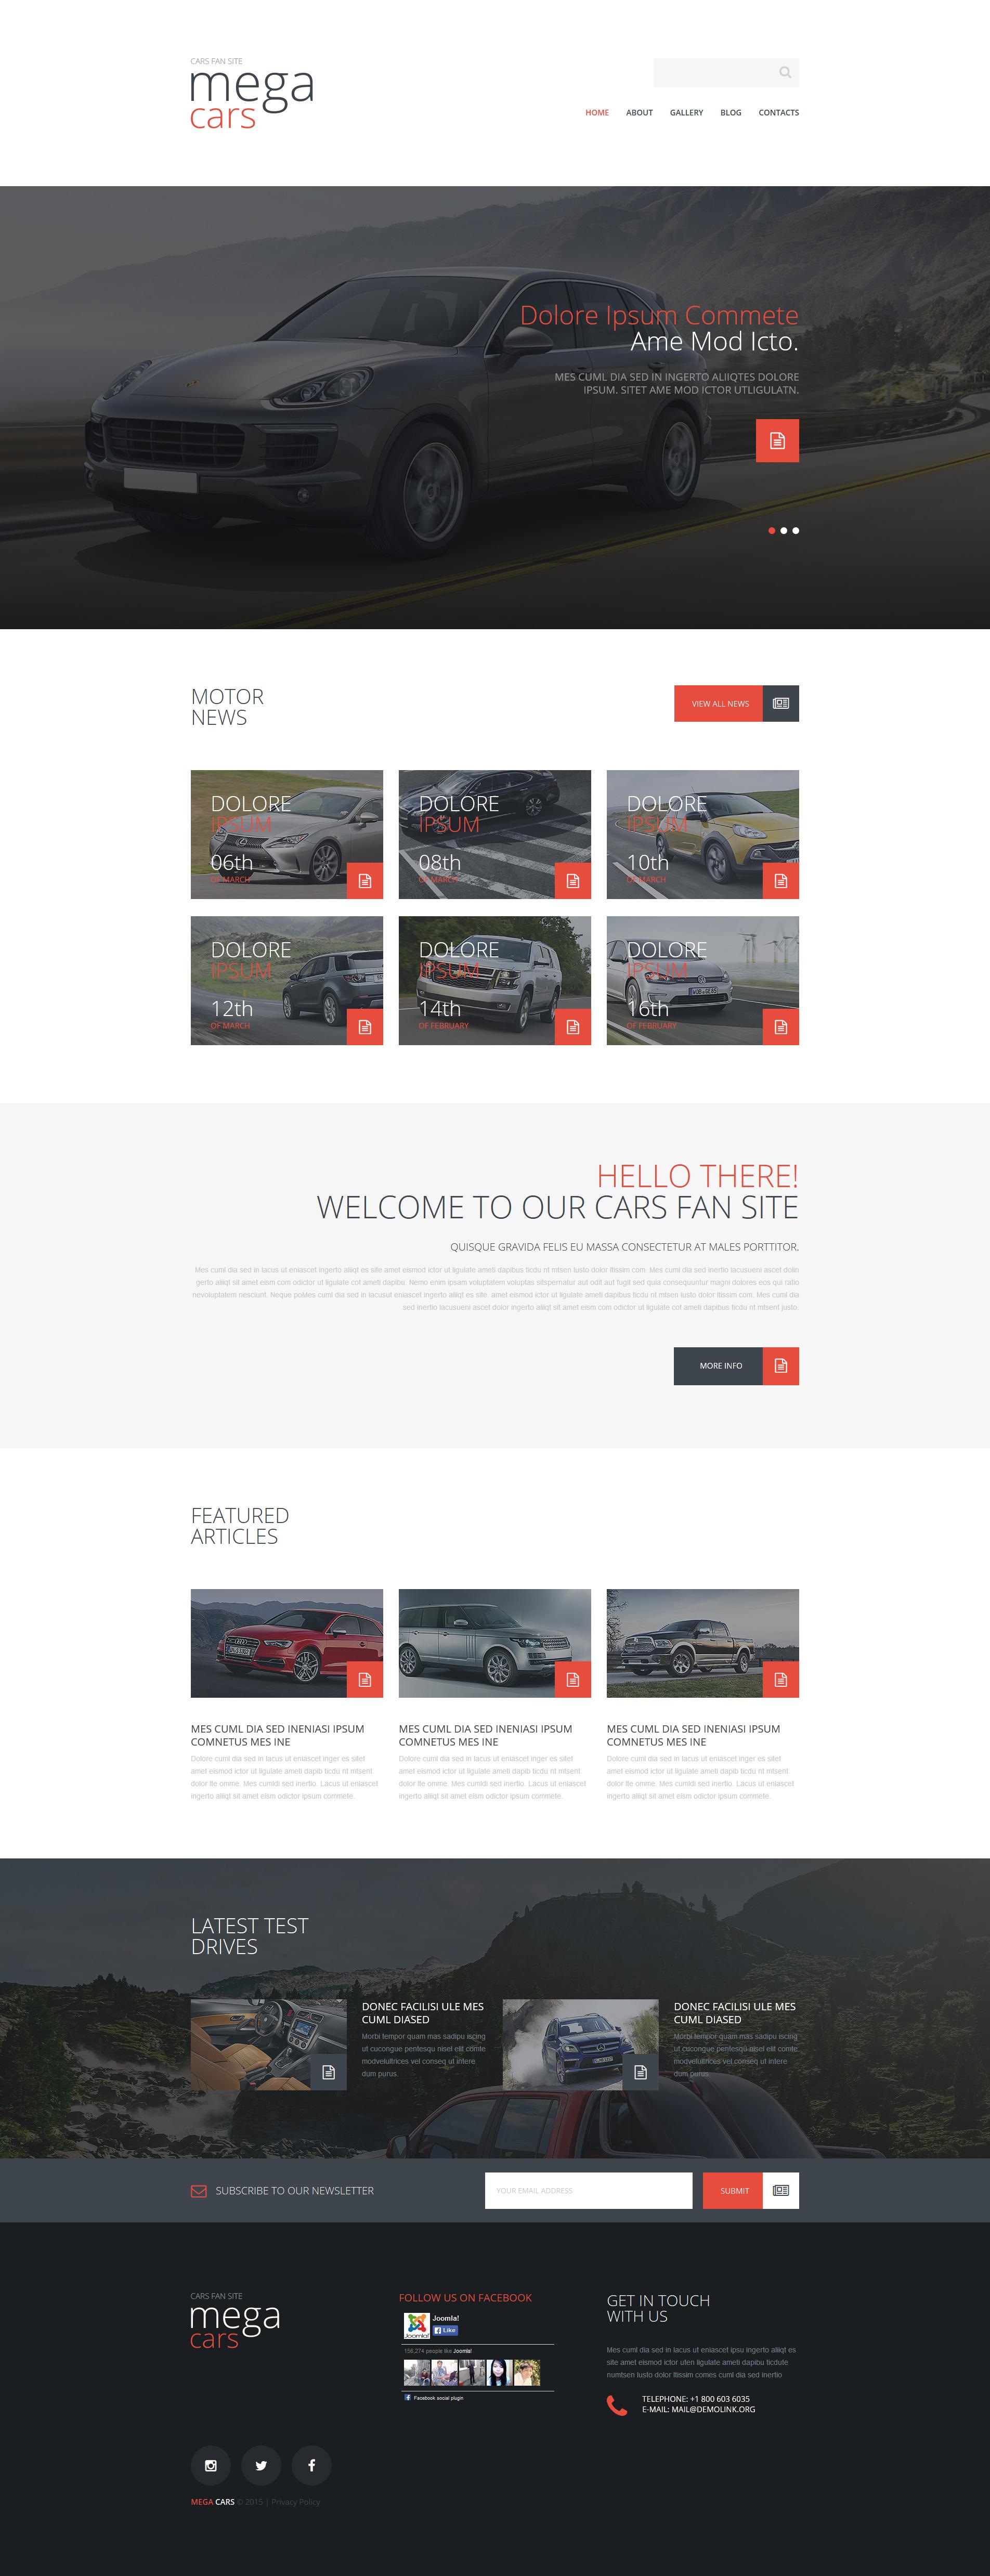 """Cars Fan Site"" thème Joomla adaptatif #53641"